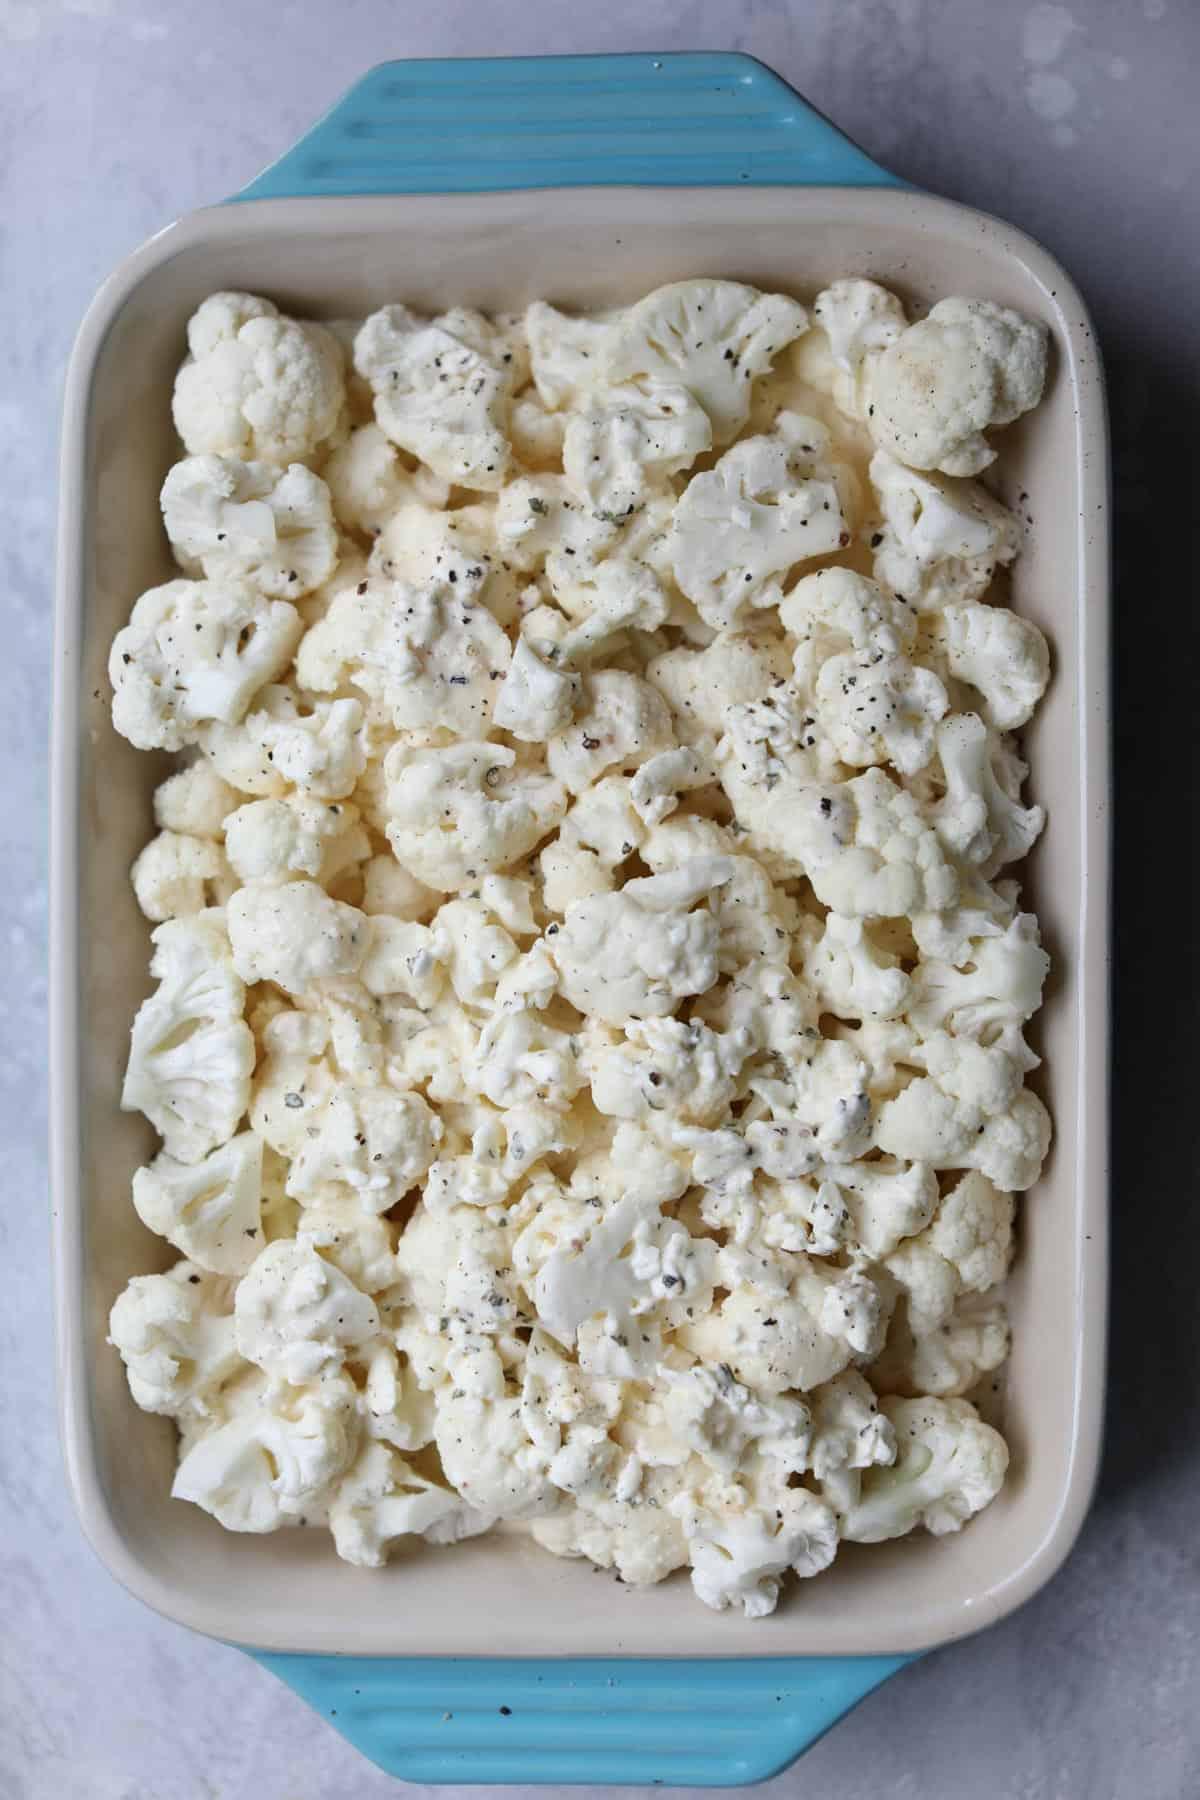 cauliflower with mac and cheese sauce